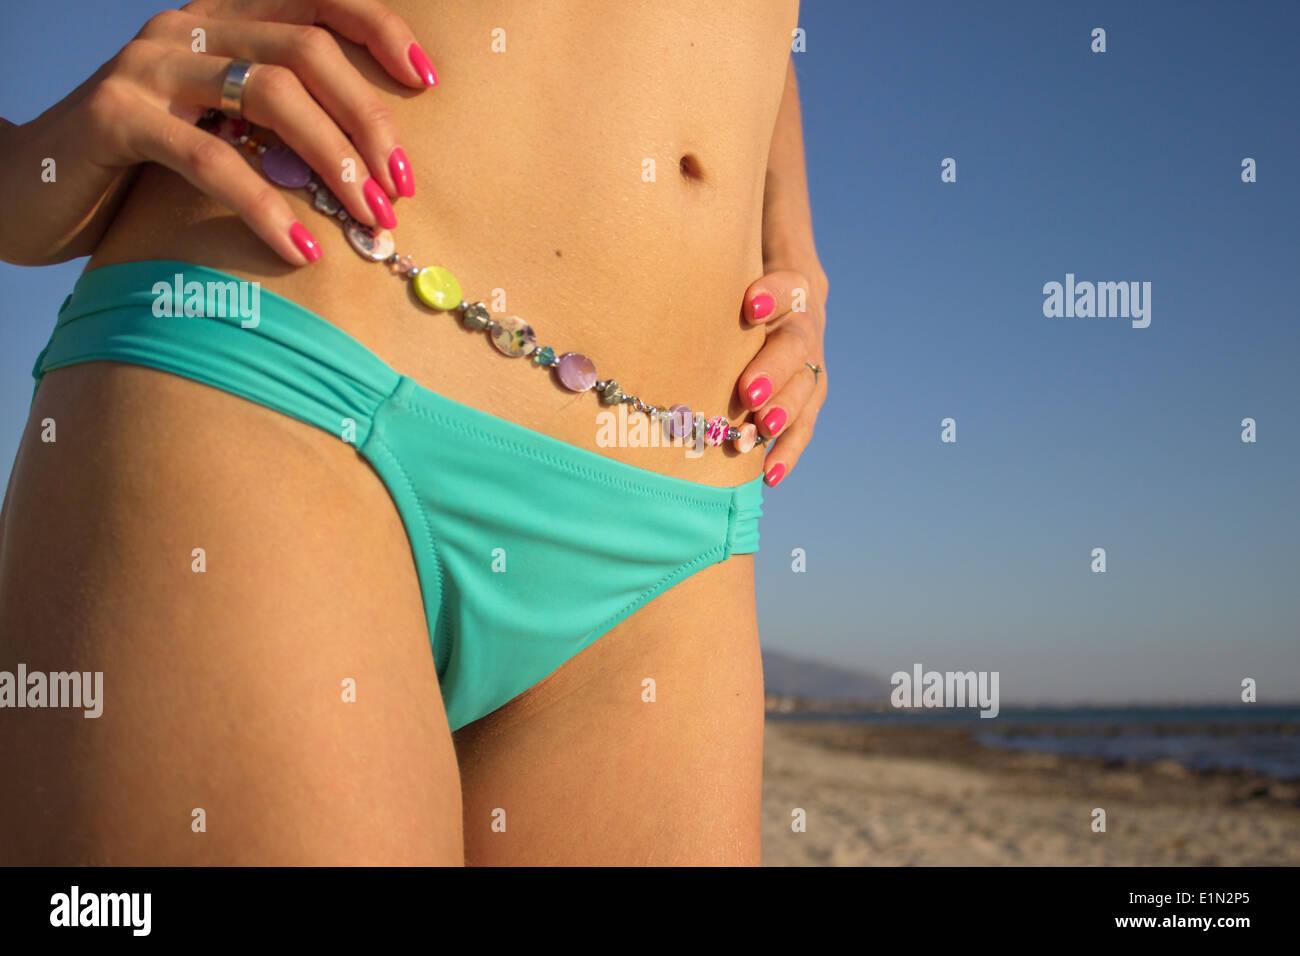 woman 'bikini bottom' body colorful closeup vivid colors colours 'hands on hips' detail slim bright beautiful  sea coast beach - Stock Image